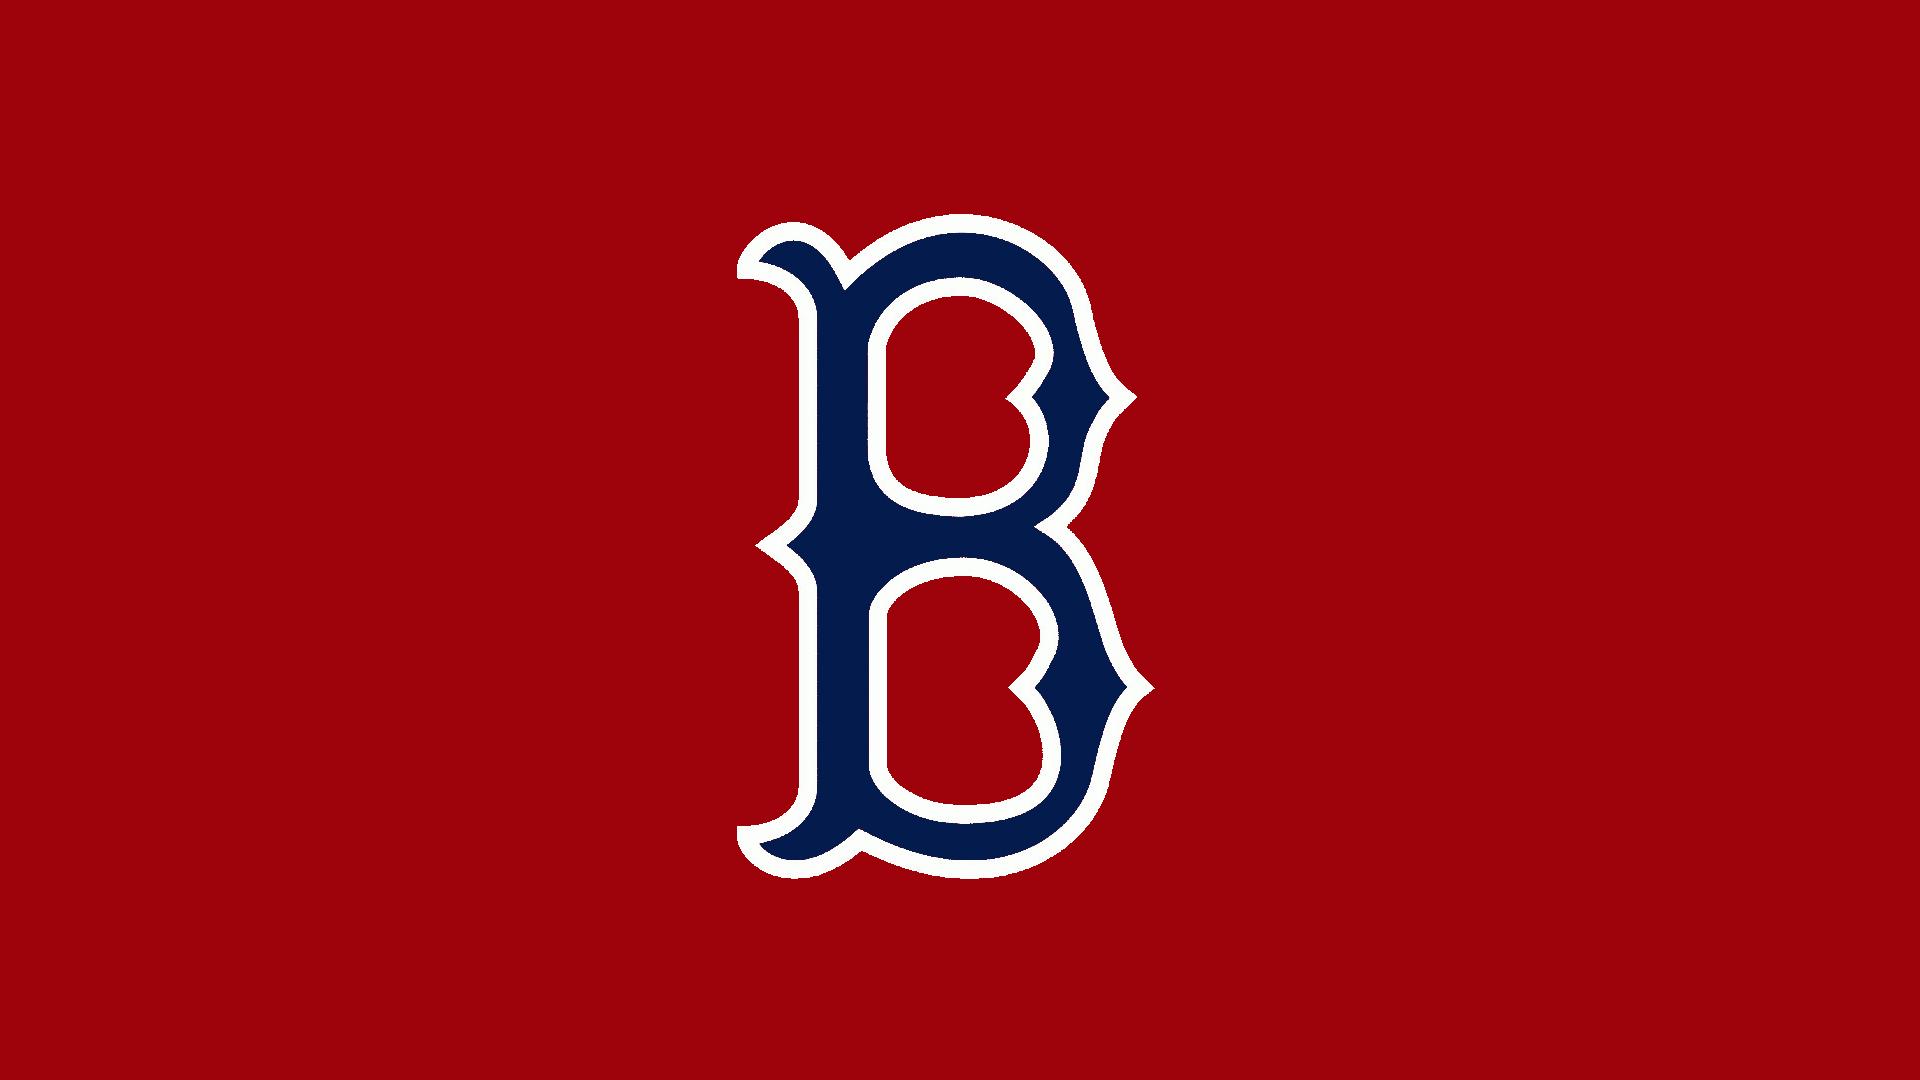 Boston Red Sox Red Sox Wallpaper 1920x1080 1920x1080